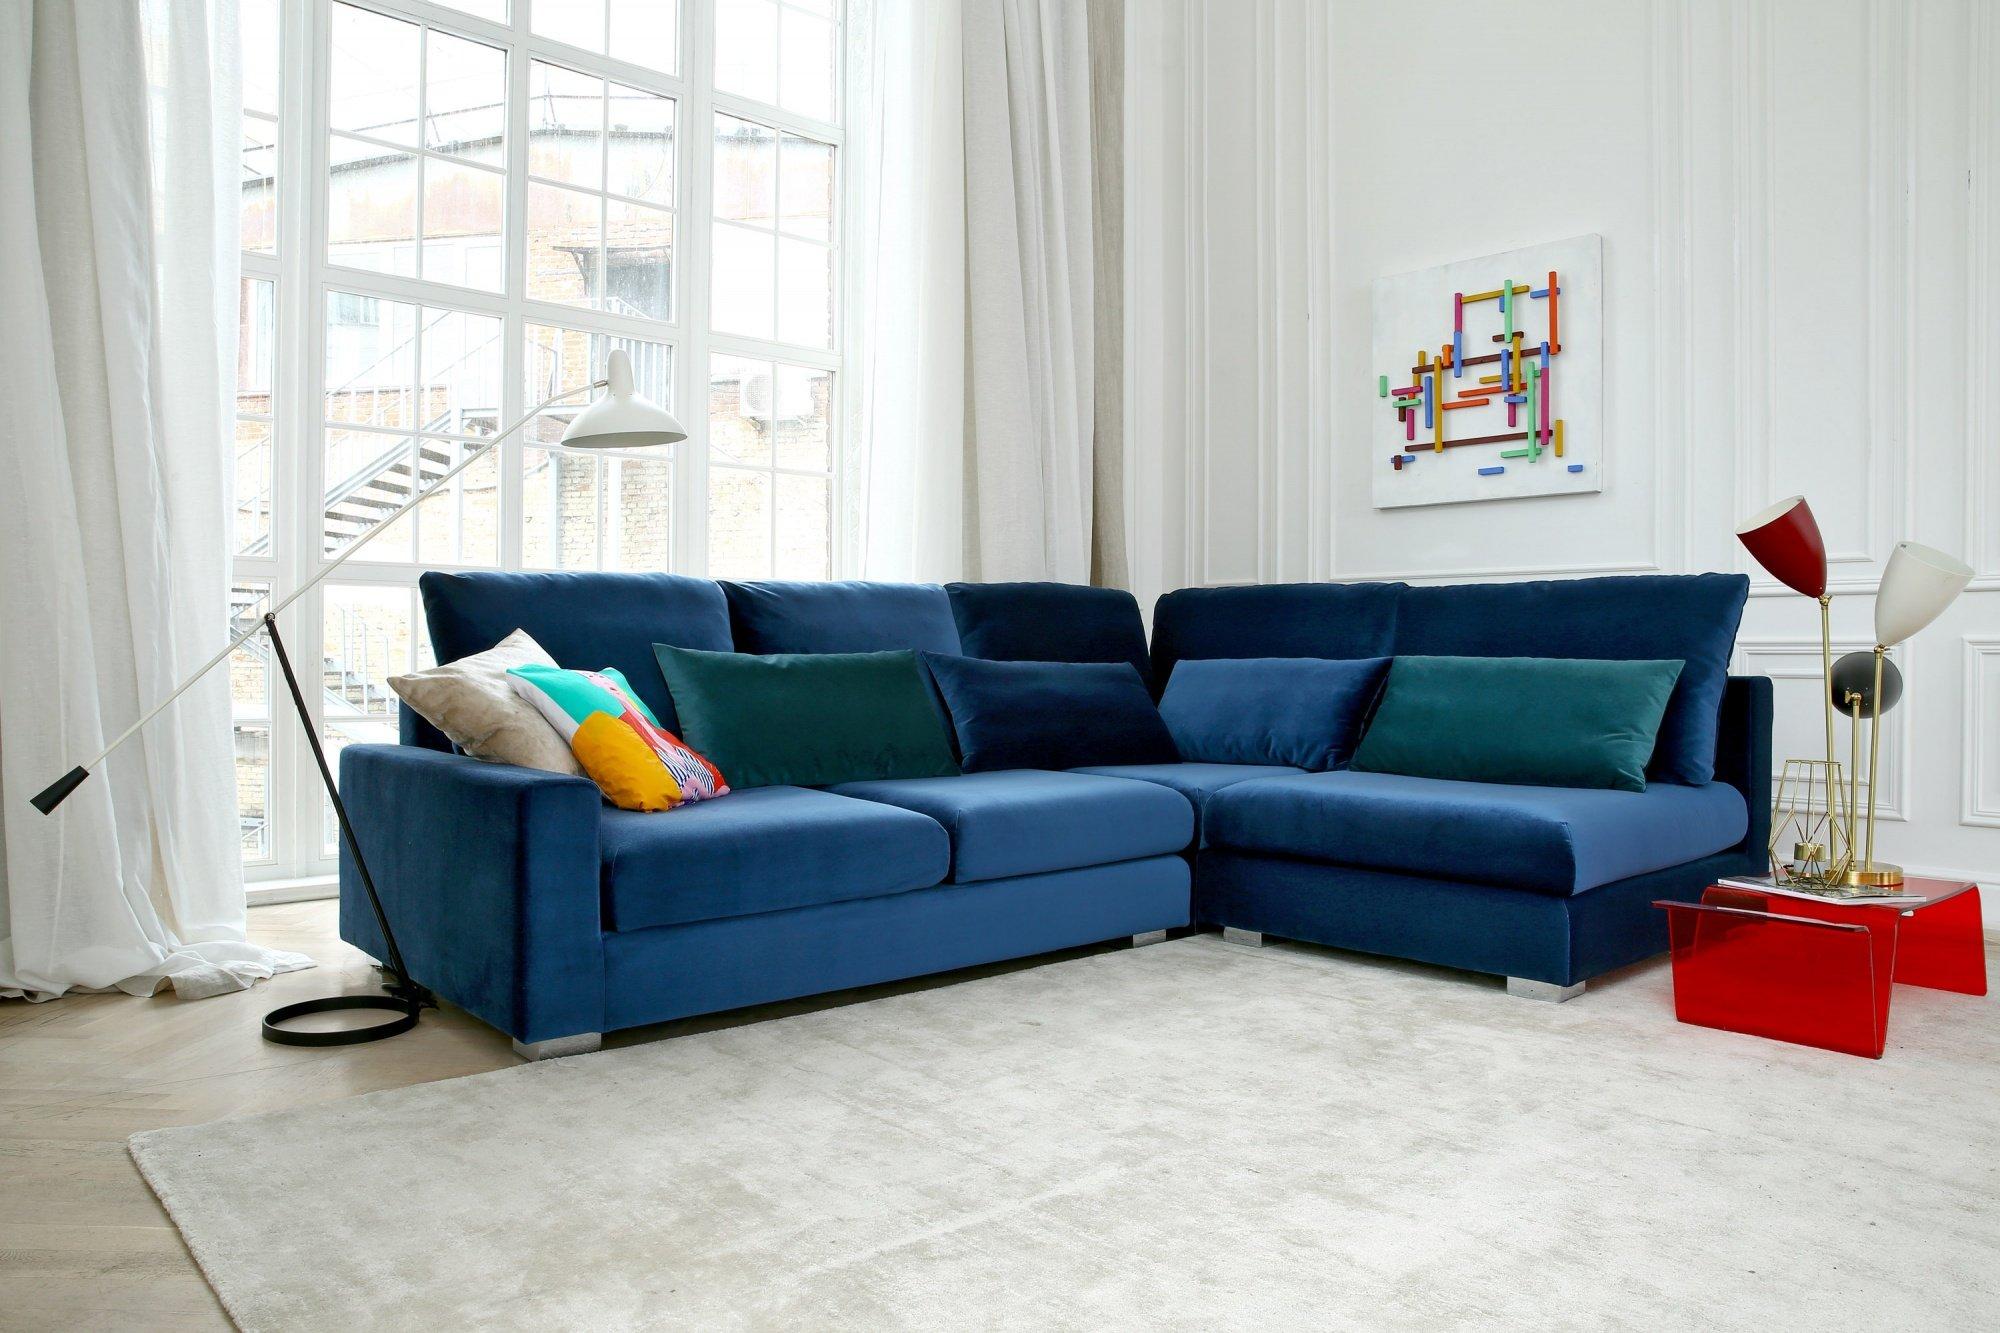 Модульный диван Арабика, фото 1